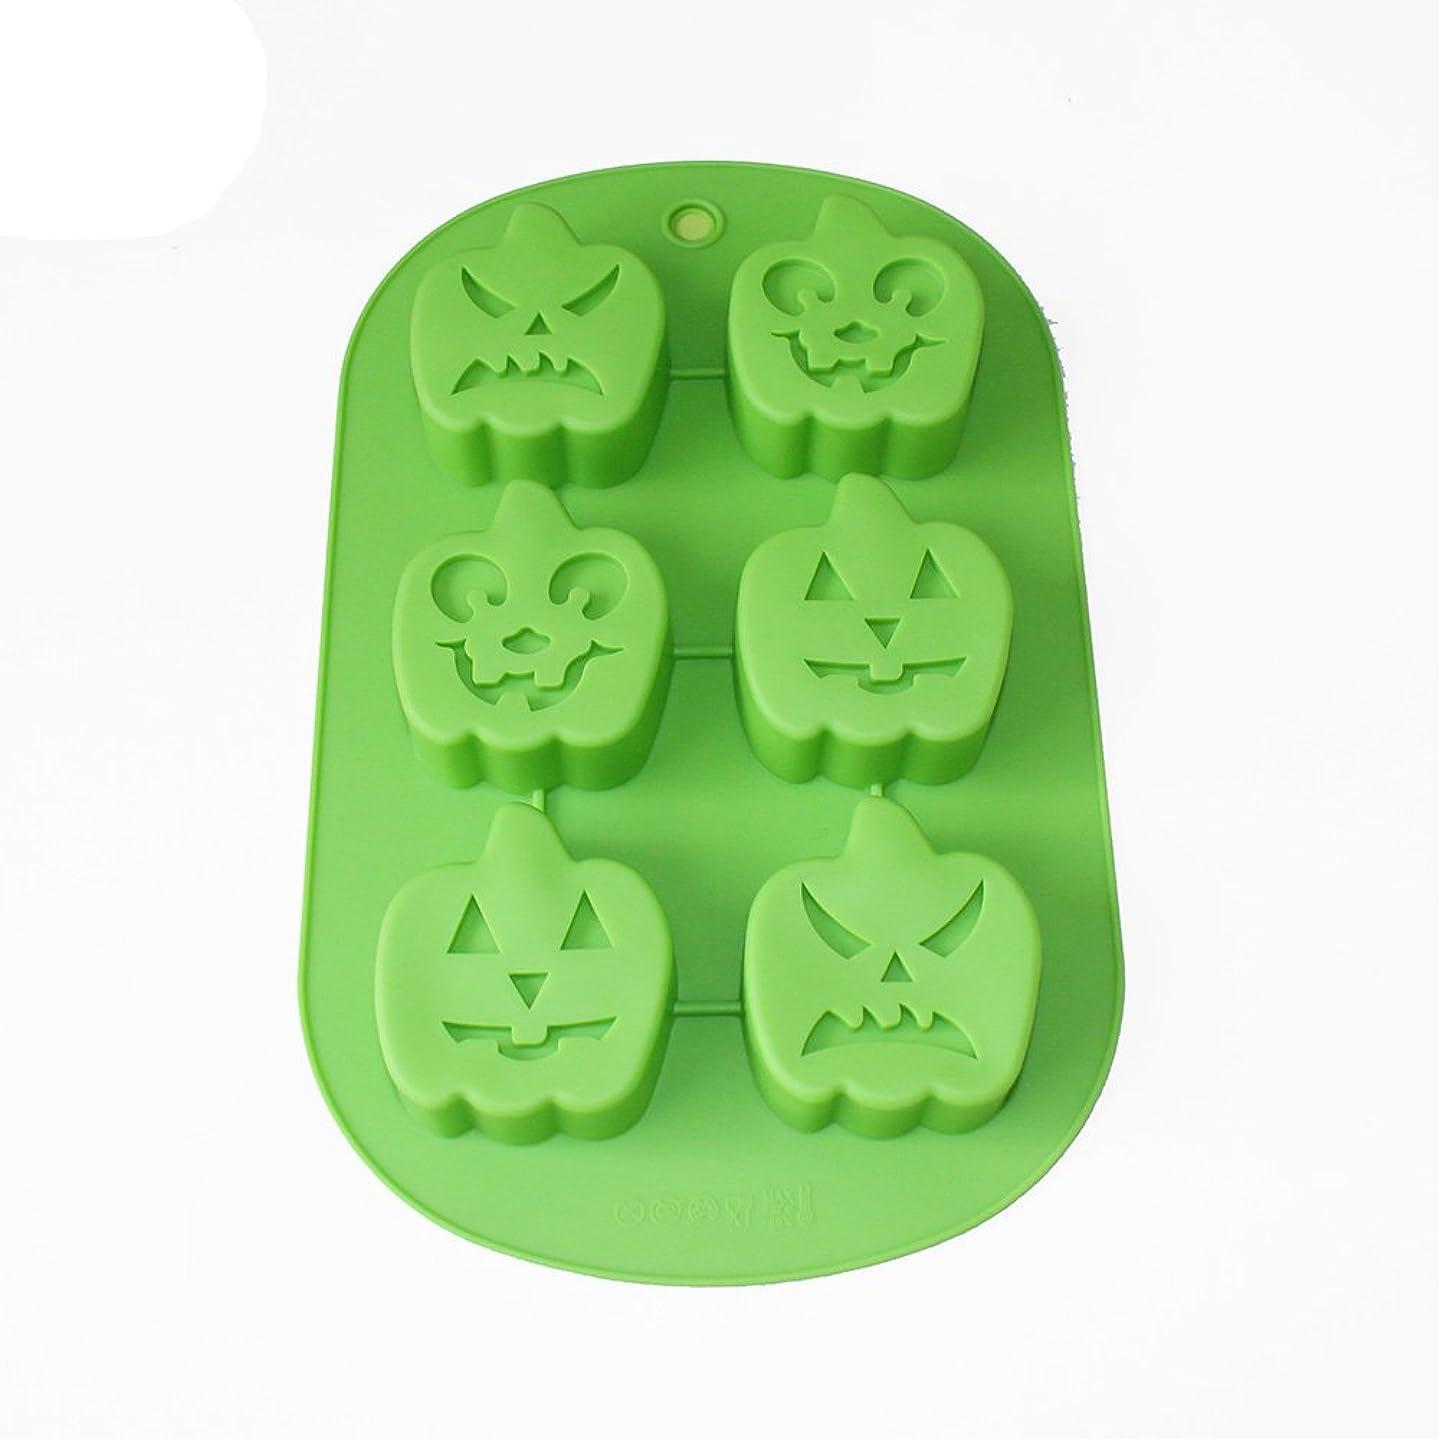 X-Haibei Pumpkin Soap Jello Ice Cream Cake Chocolate Silicone Mold 6-Cavity Soap Making Moulds